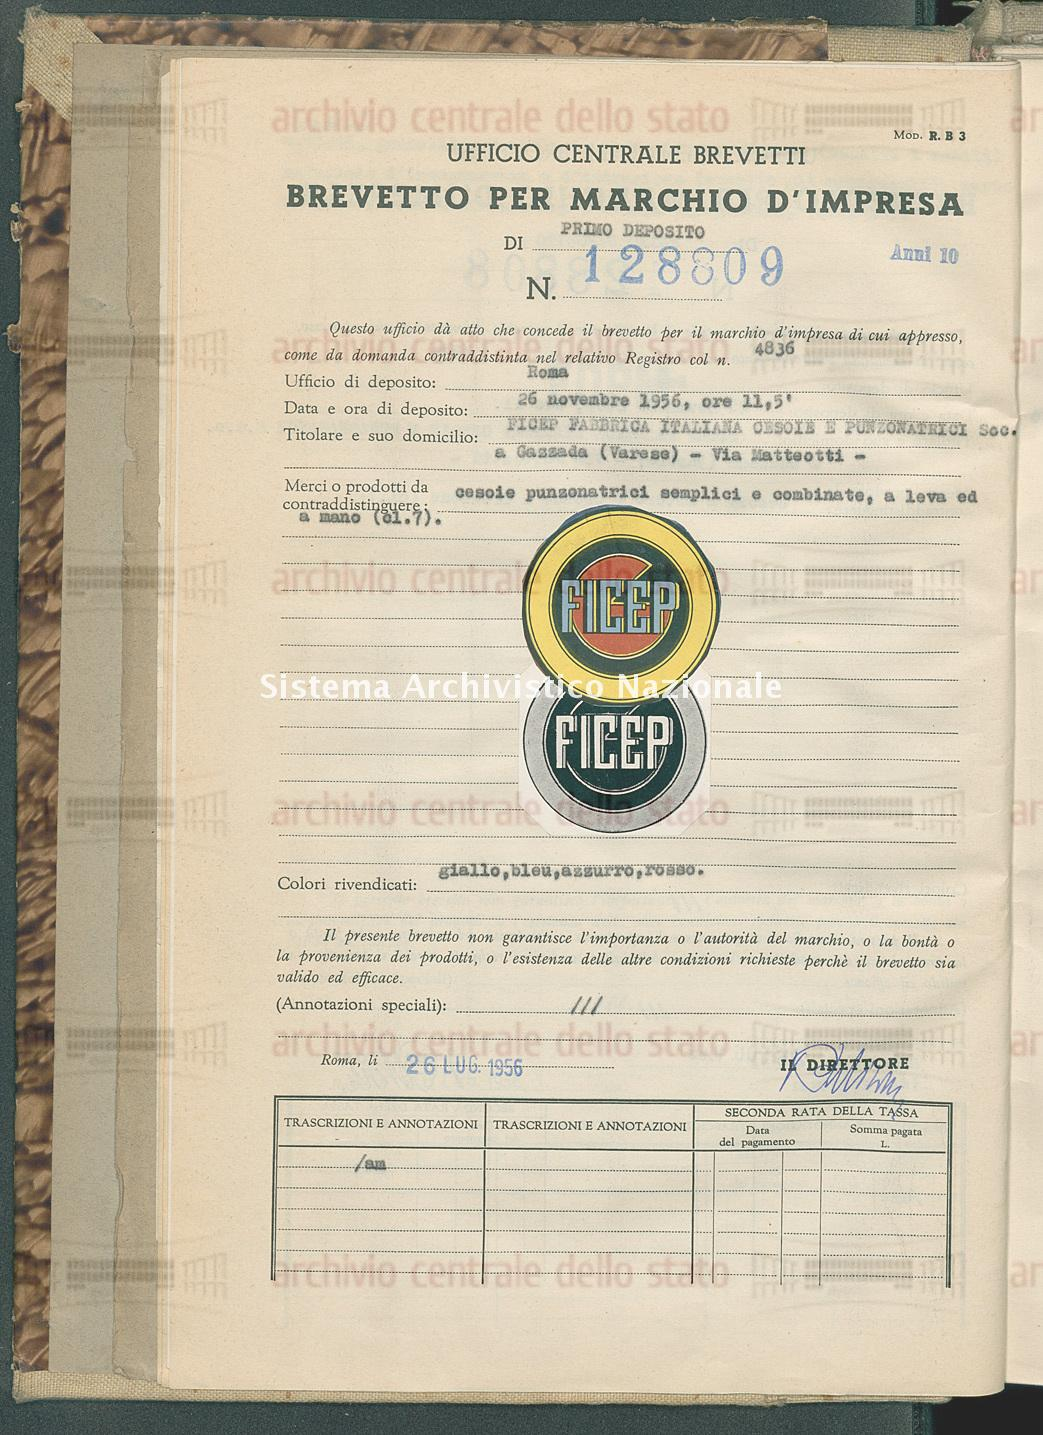 Ficep Fabbrica Italiana Cesoie E Punzonatrici S.A.S. (26/07/1956)